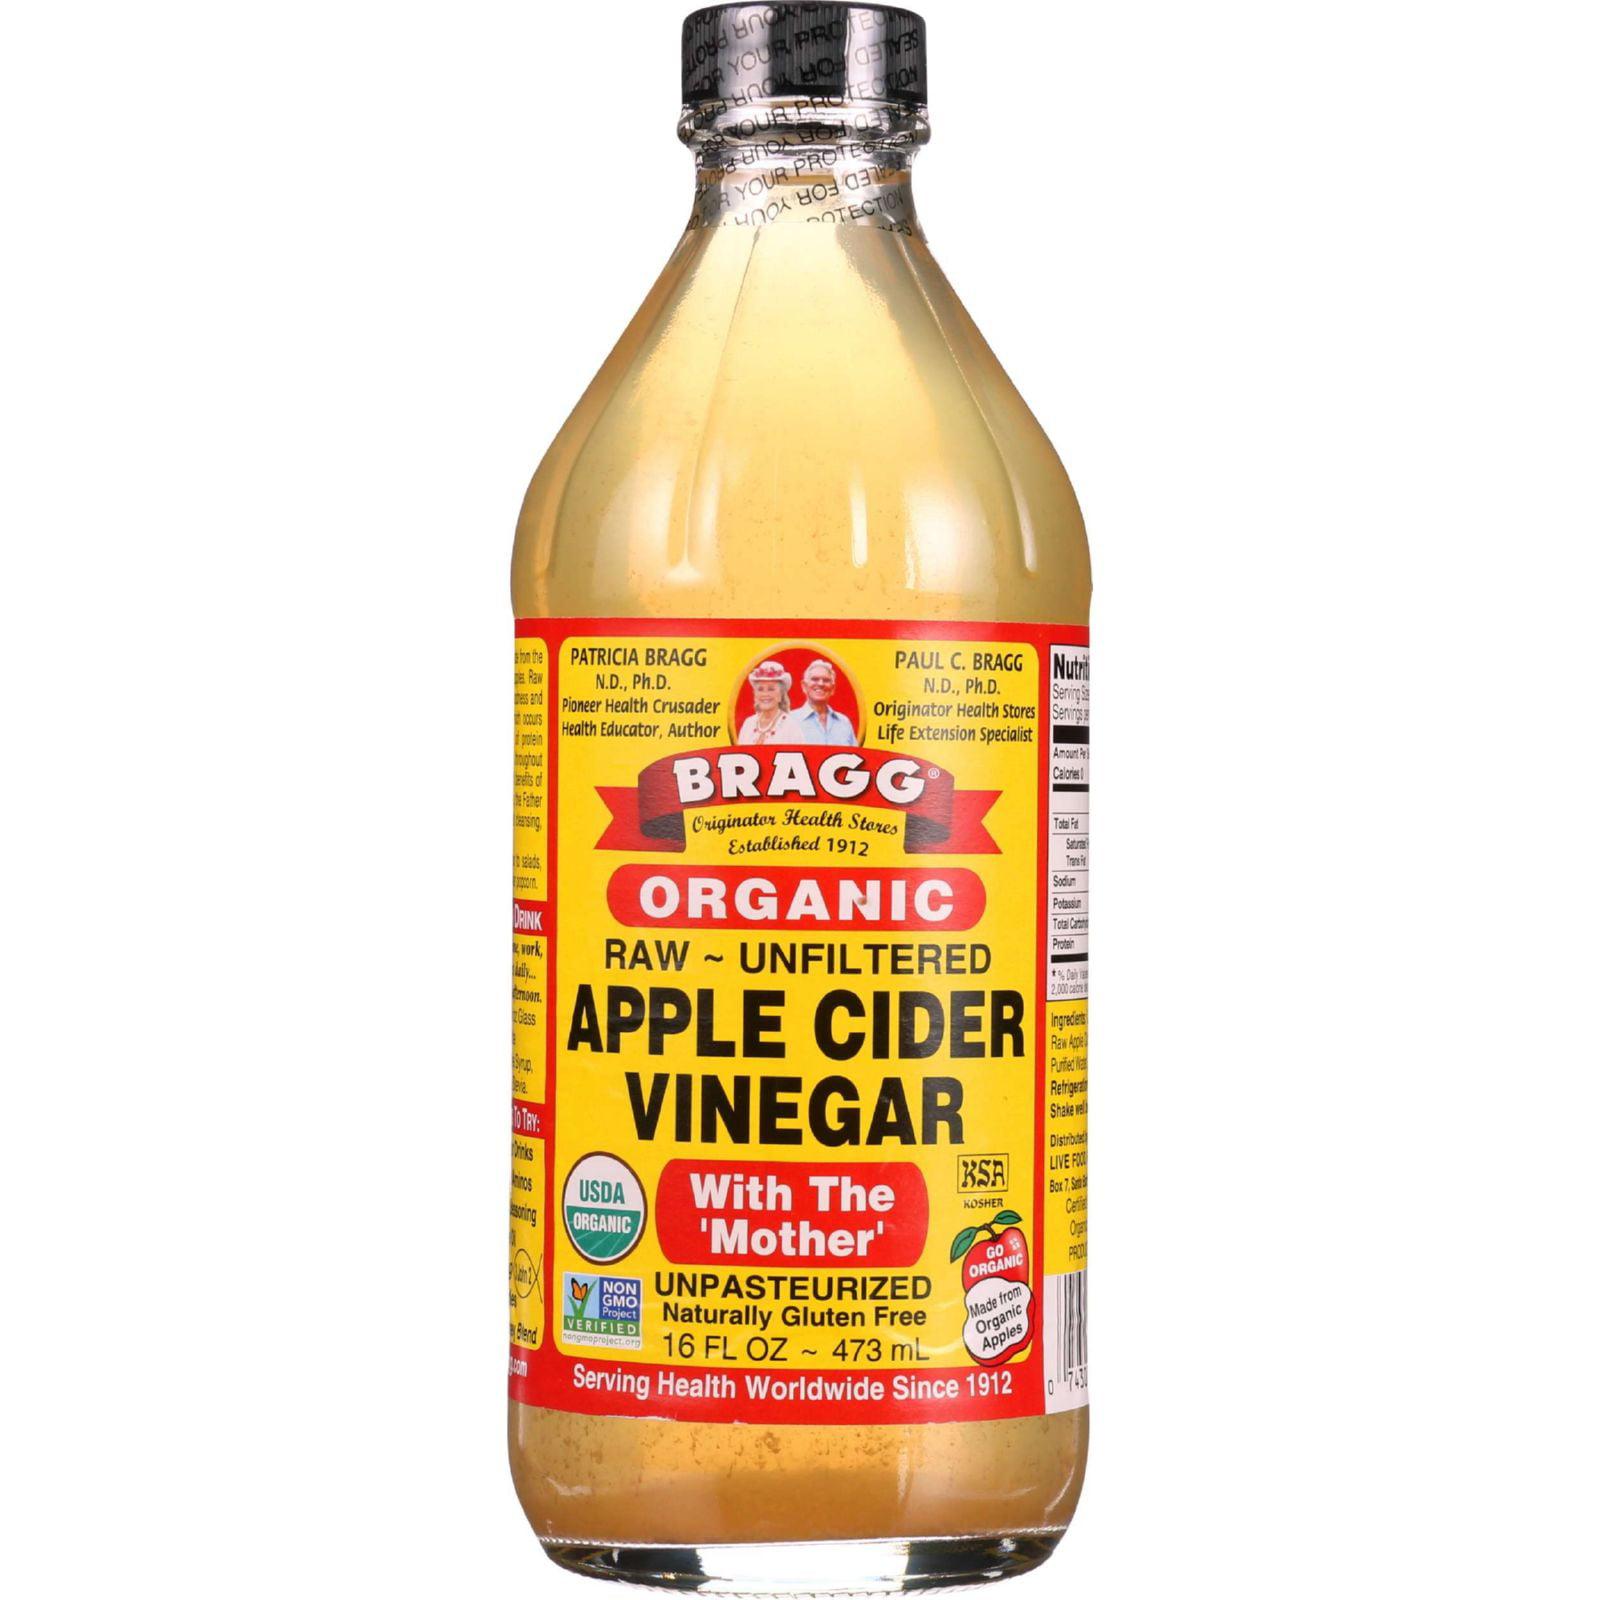 Bragg Apple Cider Vinegar Organic Raw Unfiltered 16 oz 1 each by